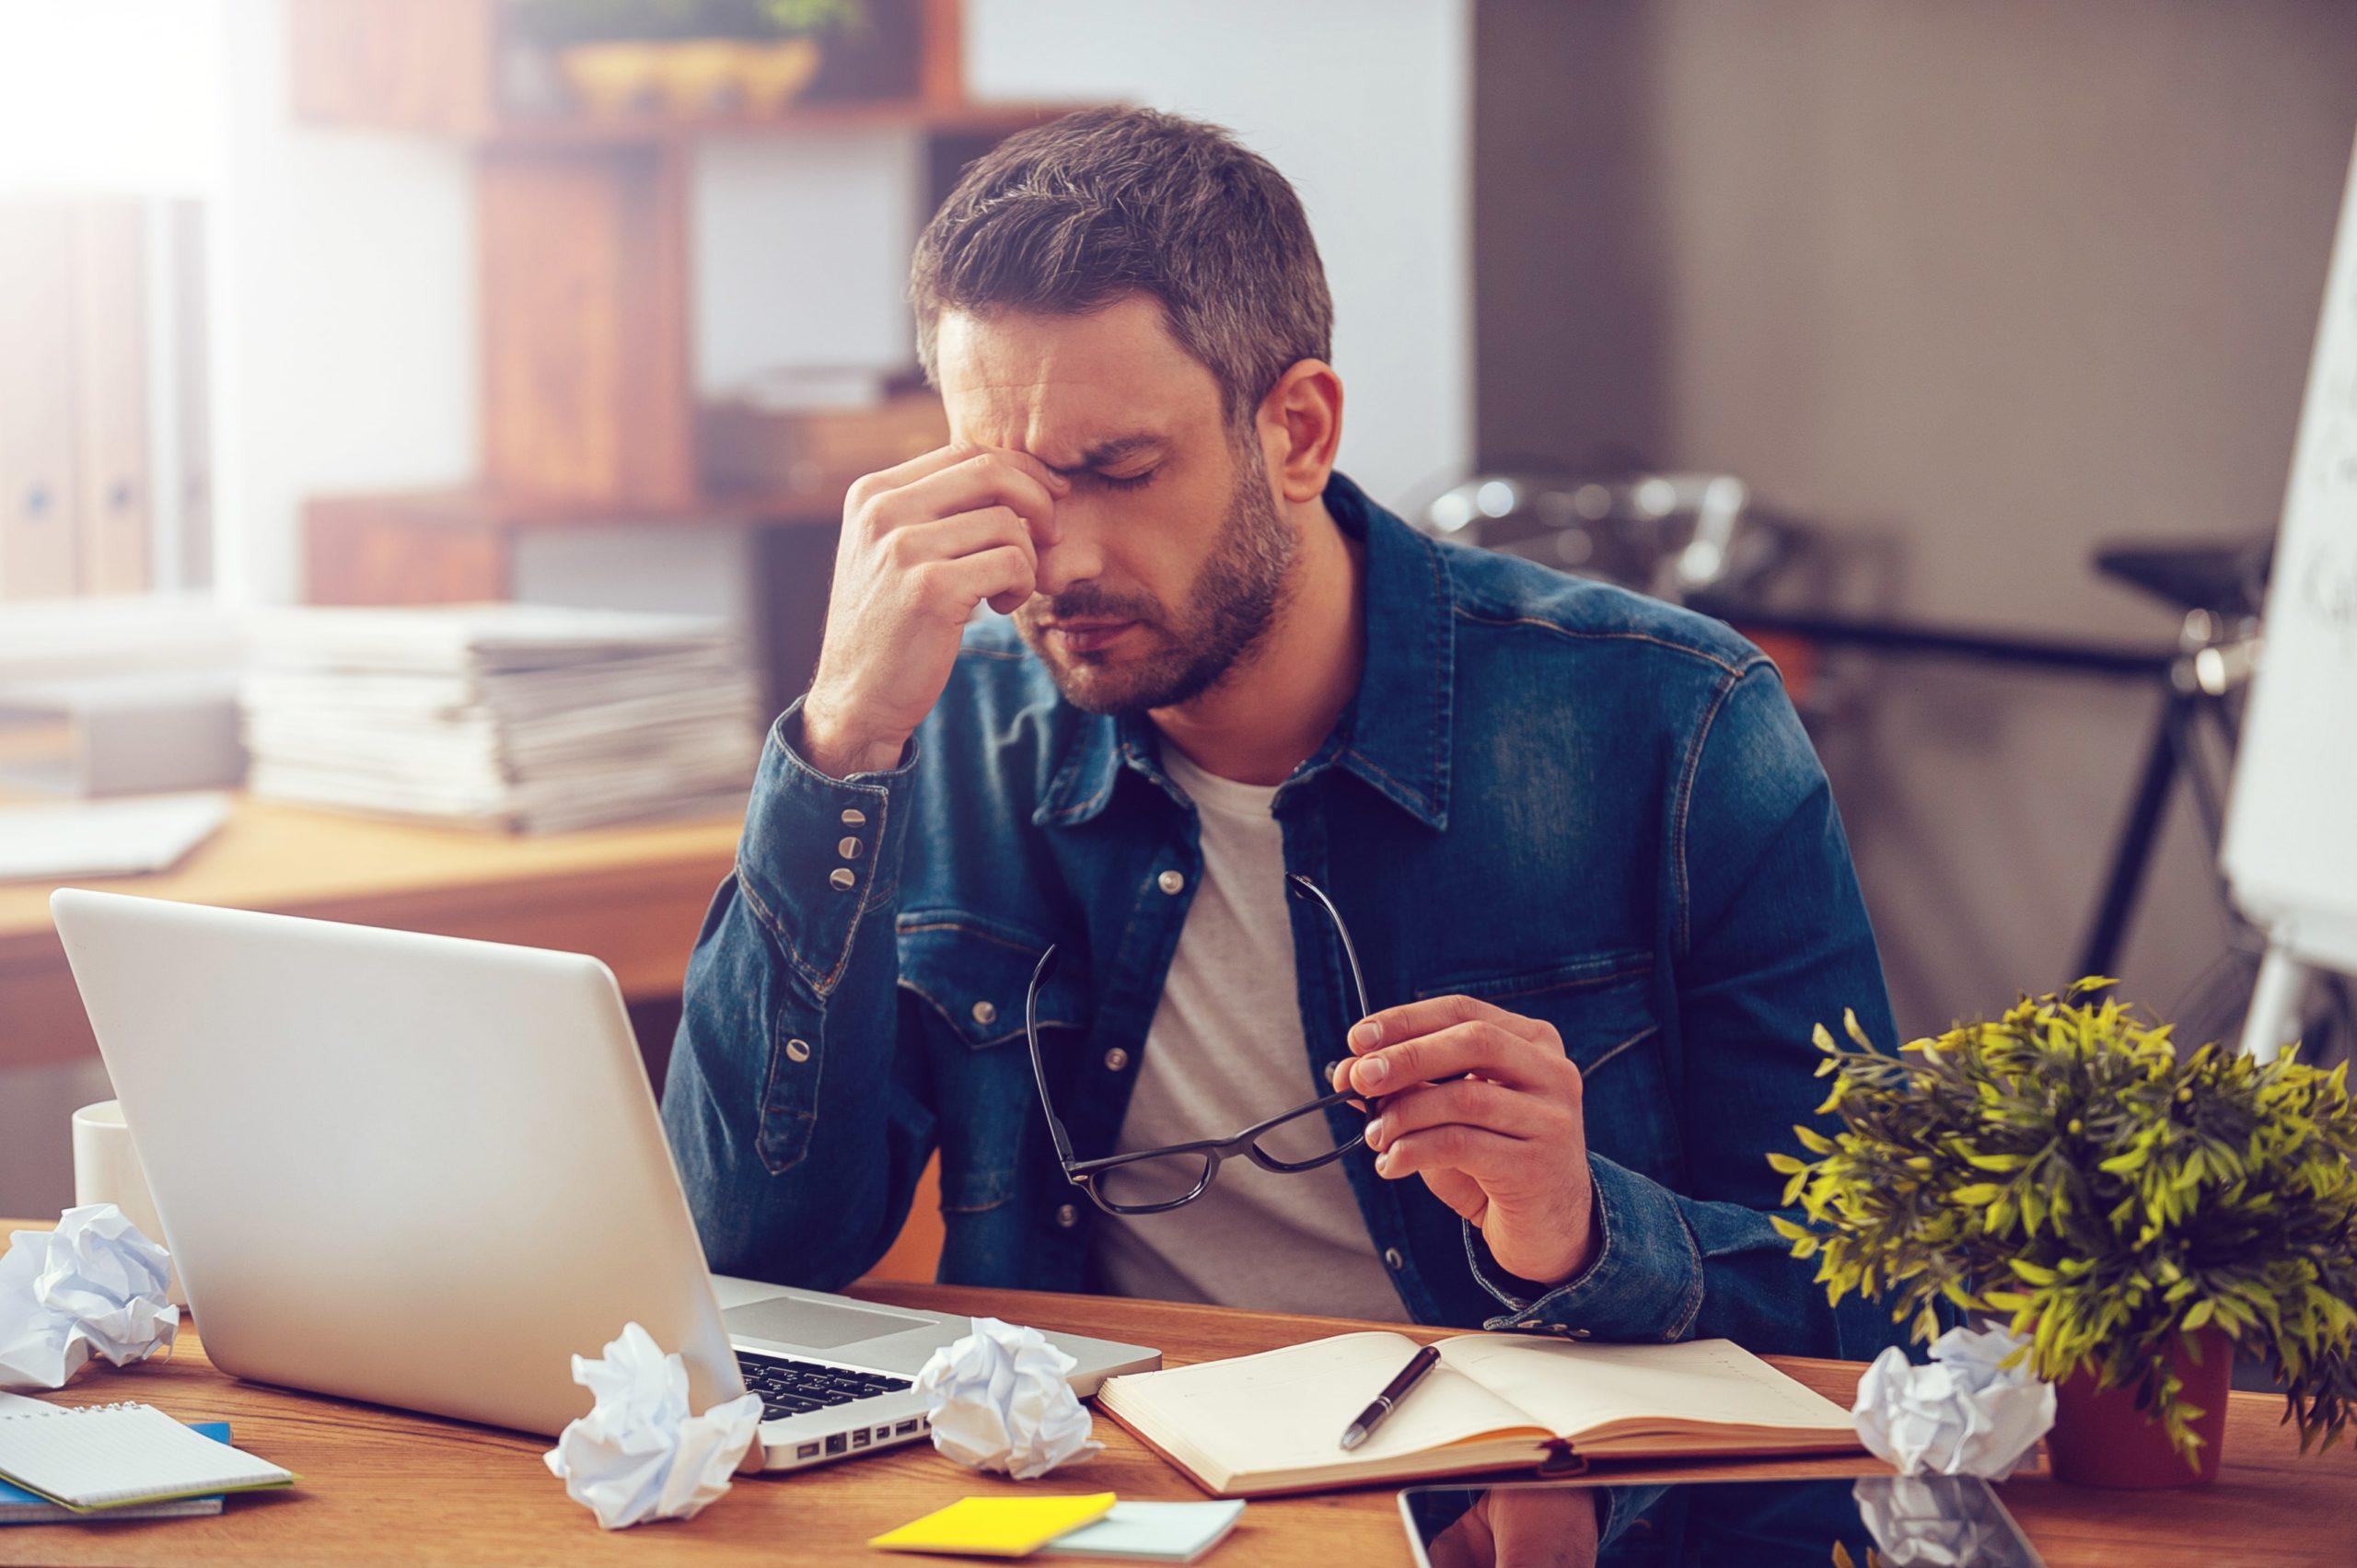 Man having trouble focusing while at work